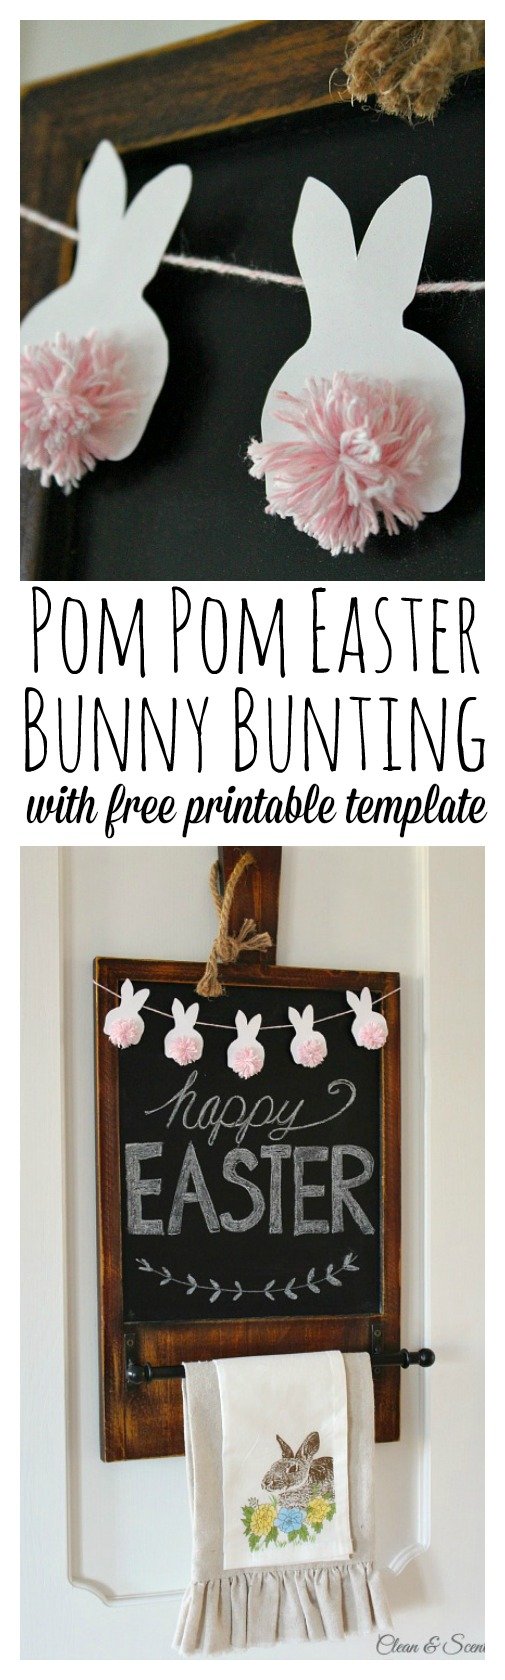 Rustic Easter Decor Craft Mini Bunny Bunting